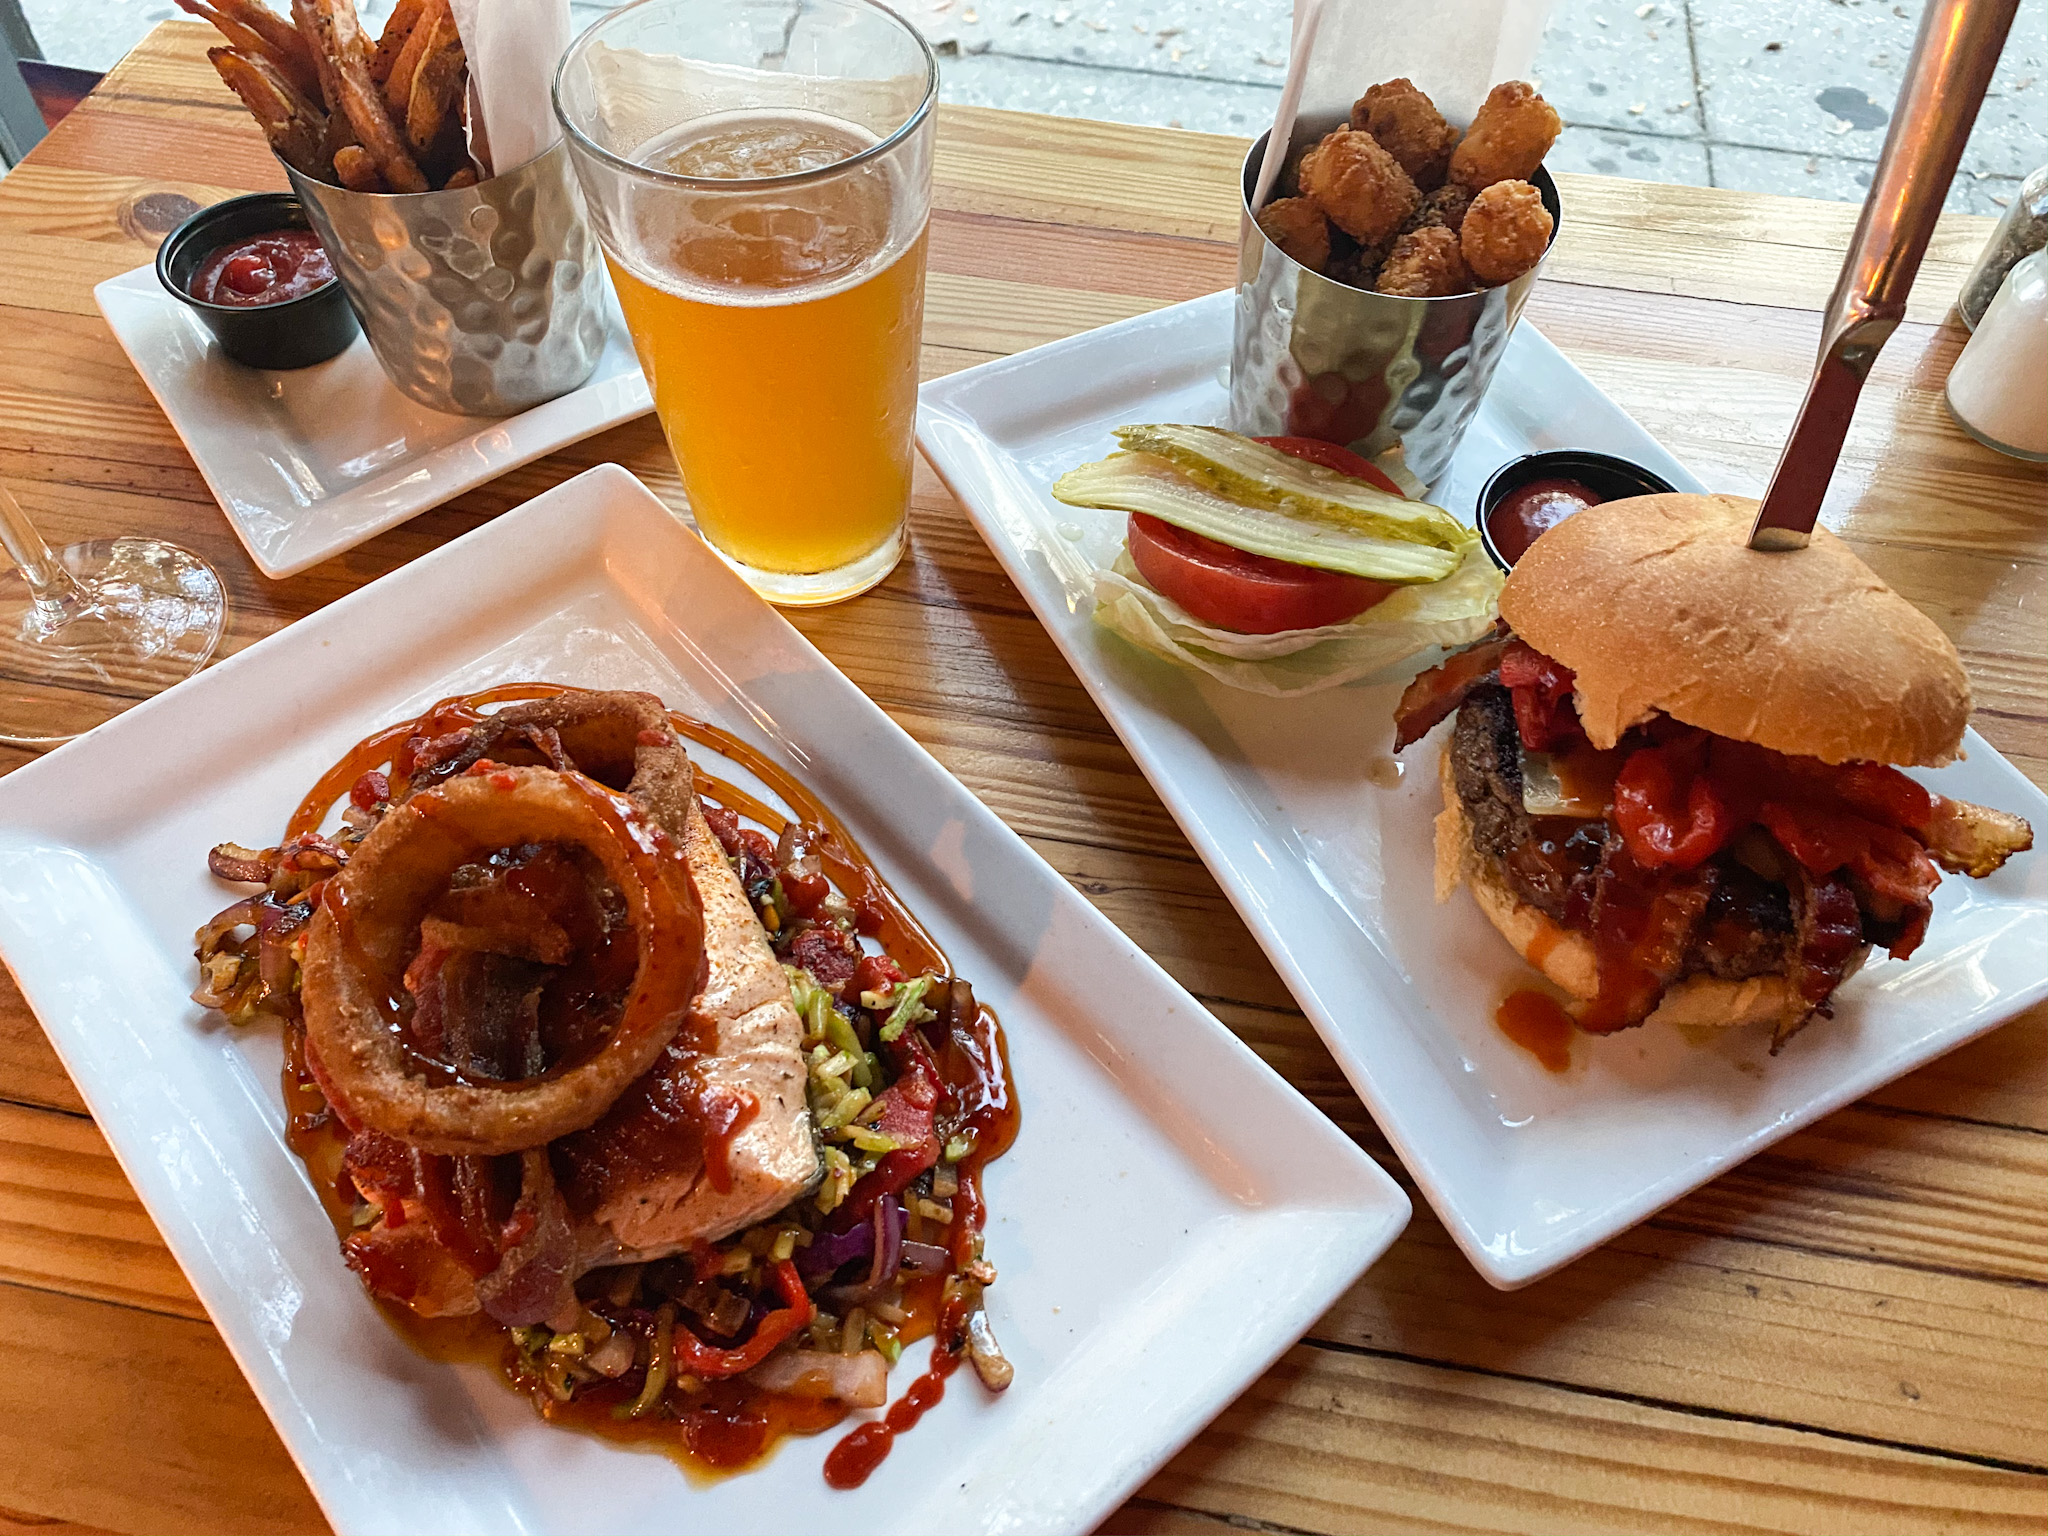 The Black Flag Burger, Sriracha Salmon, tots and sweet potato fries